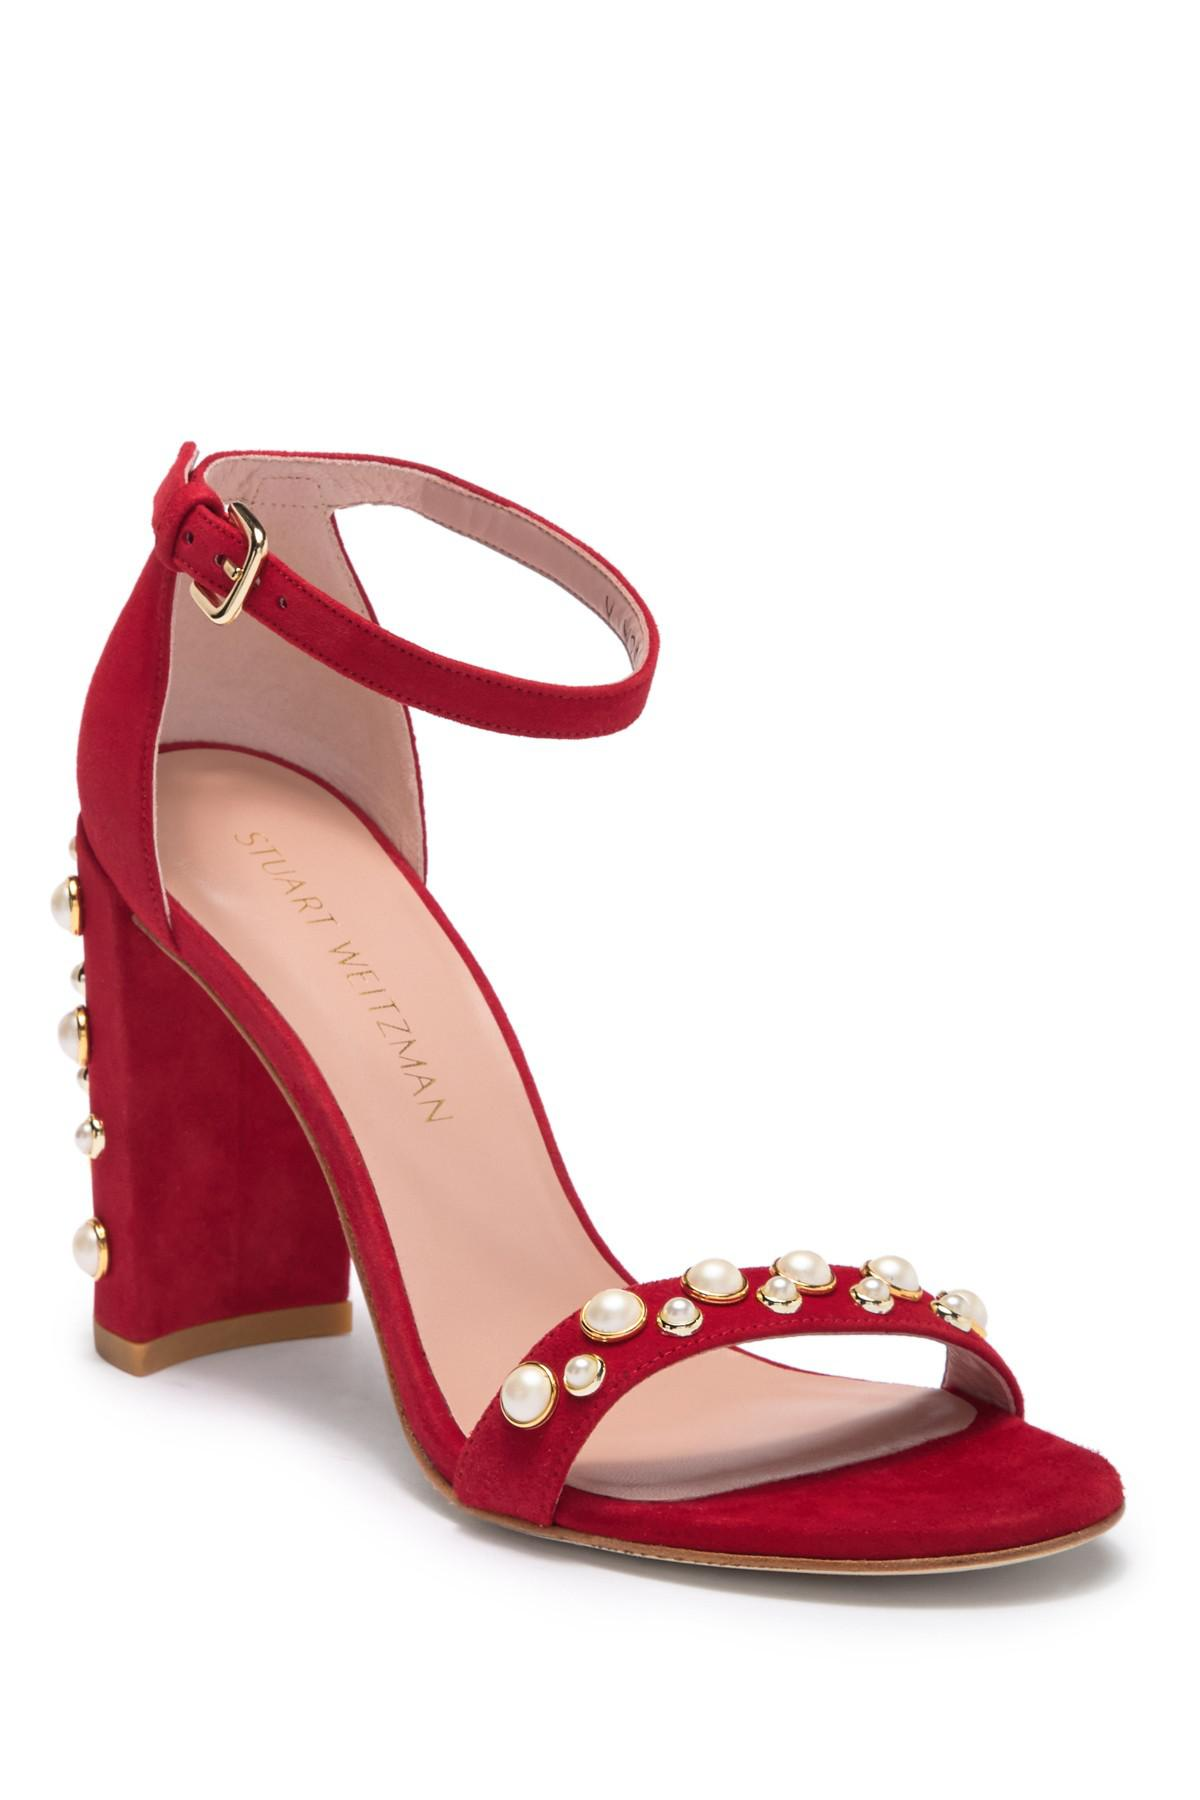 f6d1ff0ffb4 Stuart Weitzman - Red More Pearls Block Heel Suede Sandal - Lyst. View  fullscreen